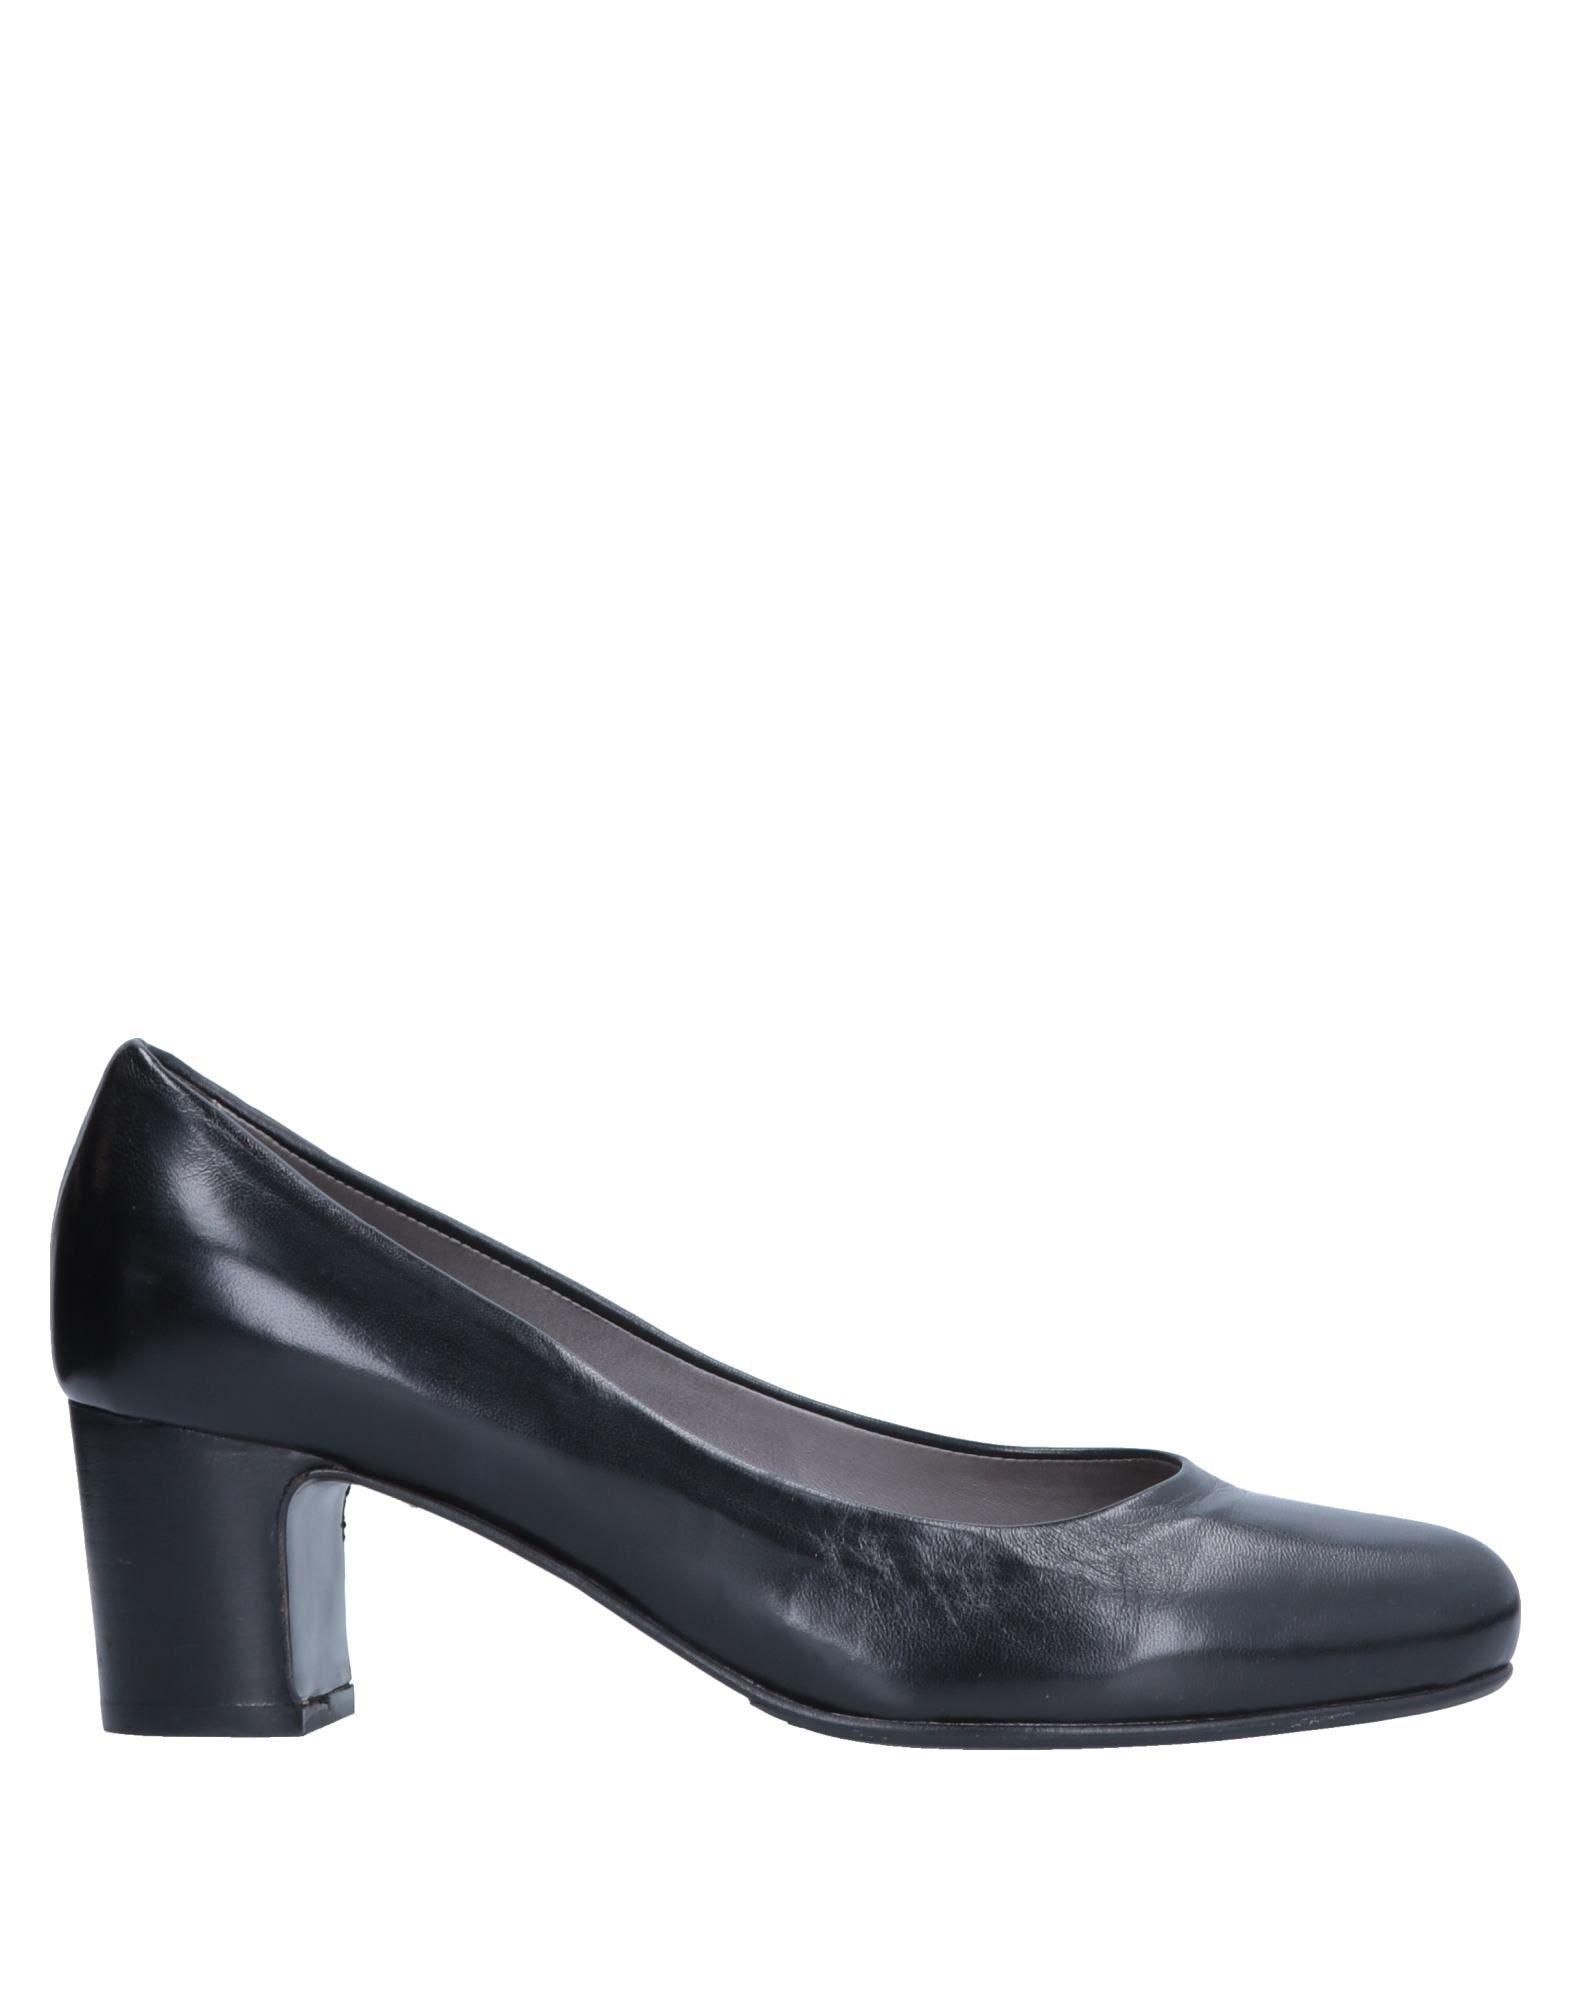 Sandali Carmens offerte Donna - 11547609CK Nuove offerte Carmens e scarpe comode 4d8cb6